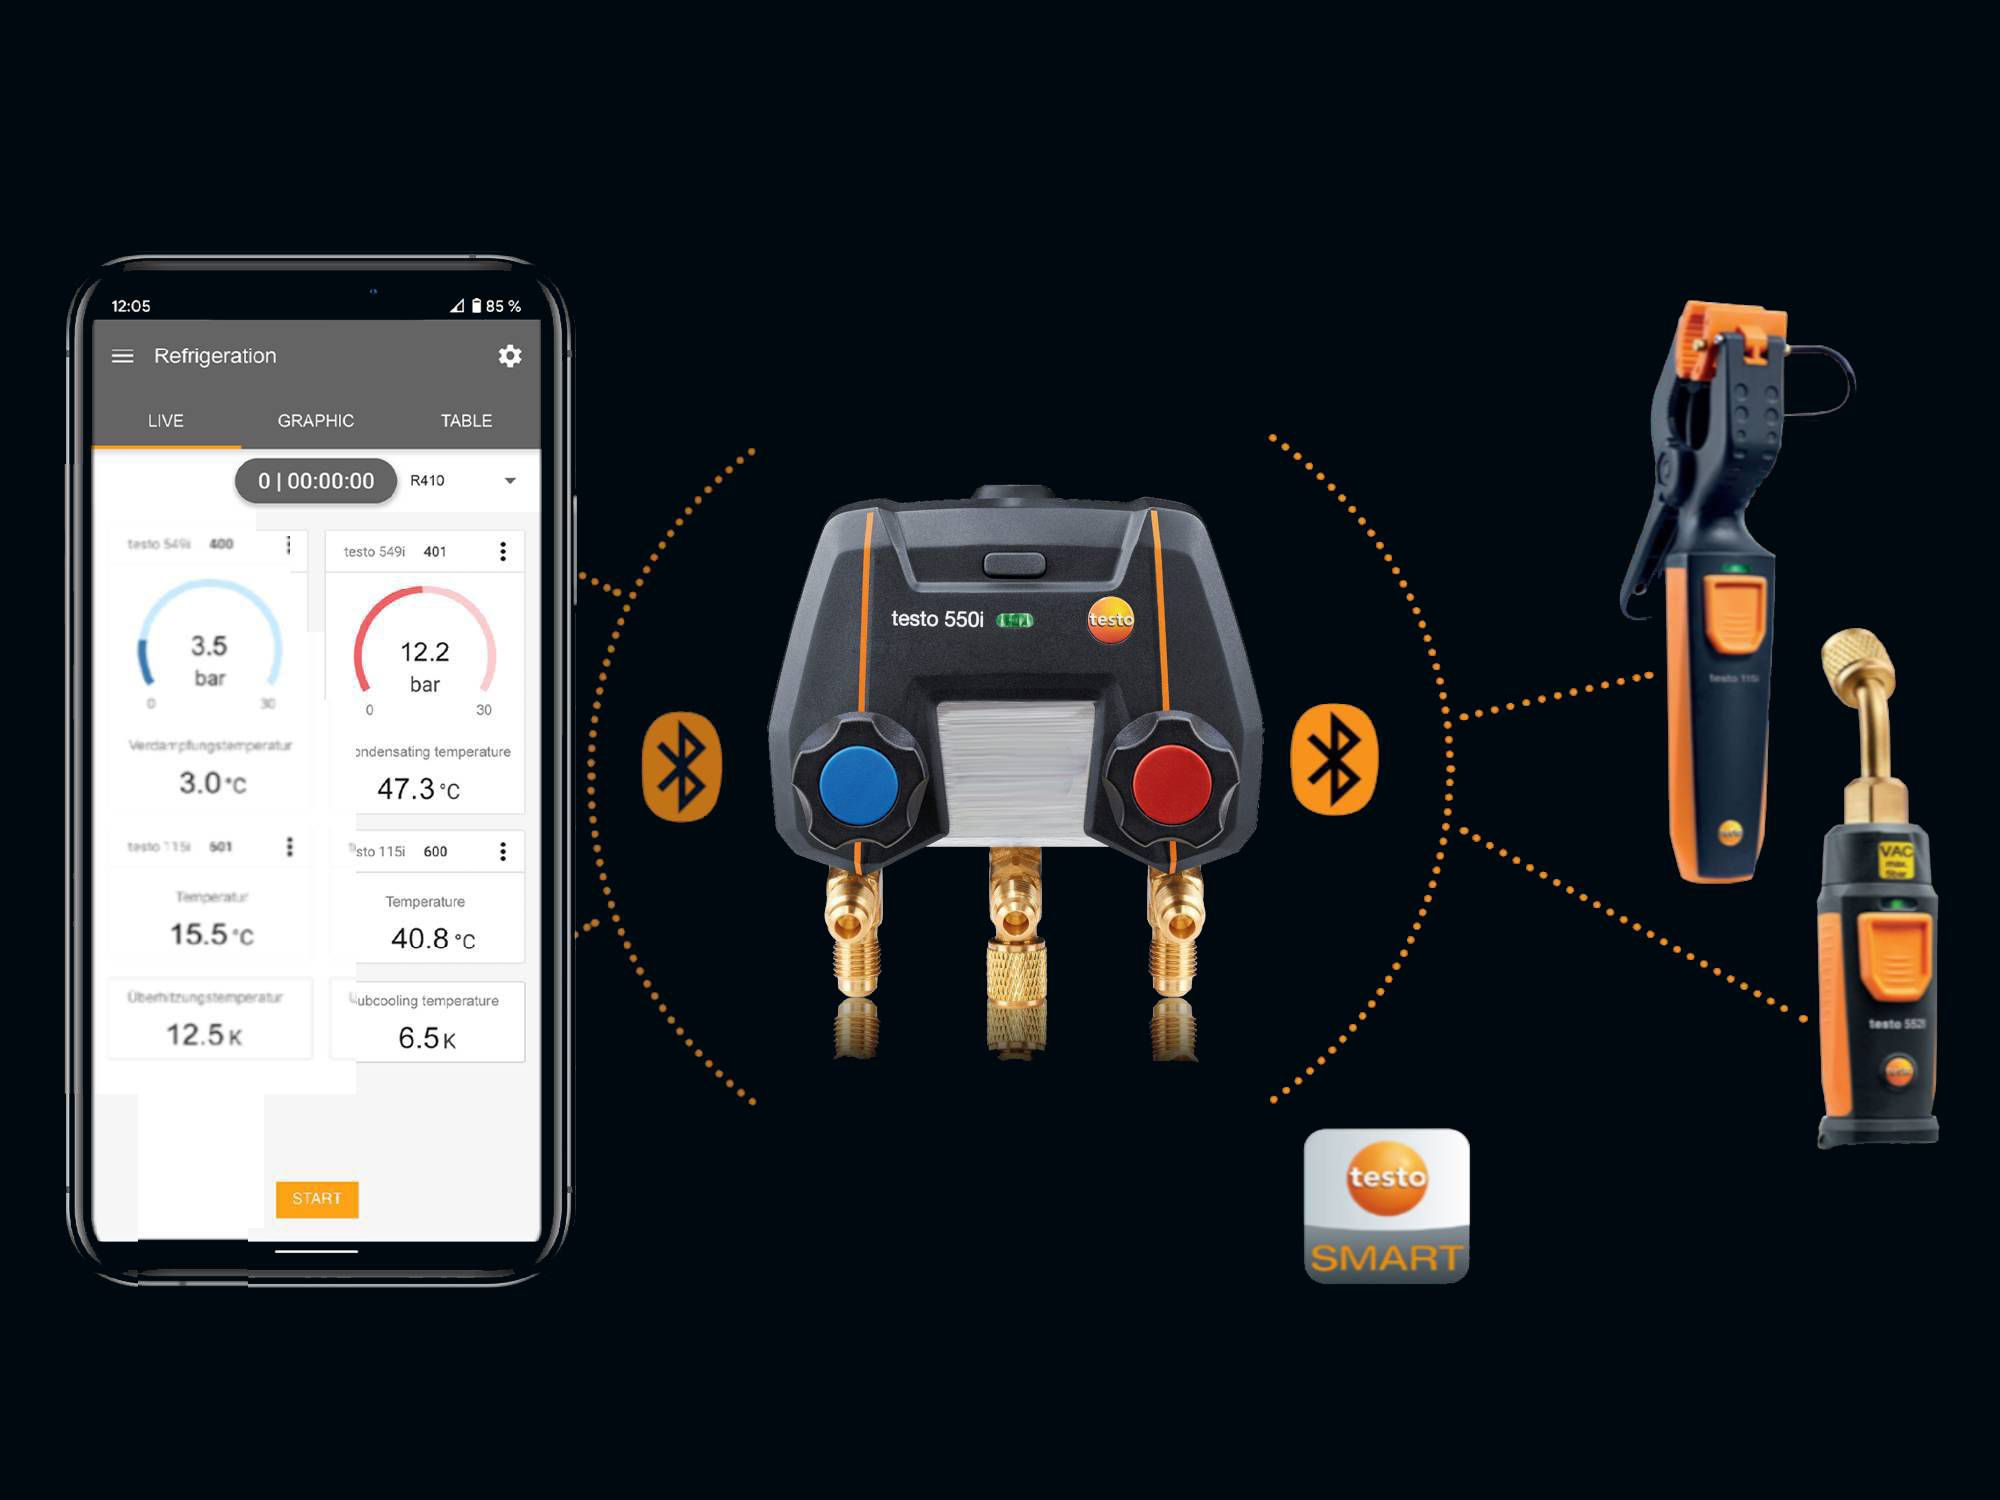 testo Smart App, testo 550i, testo 552i